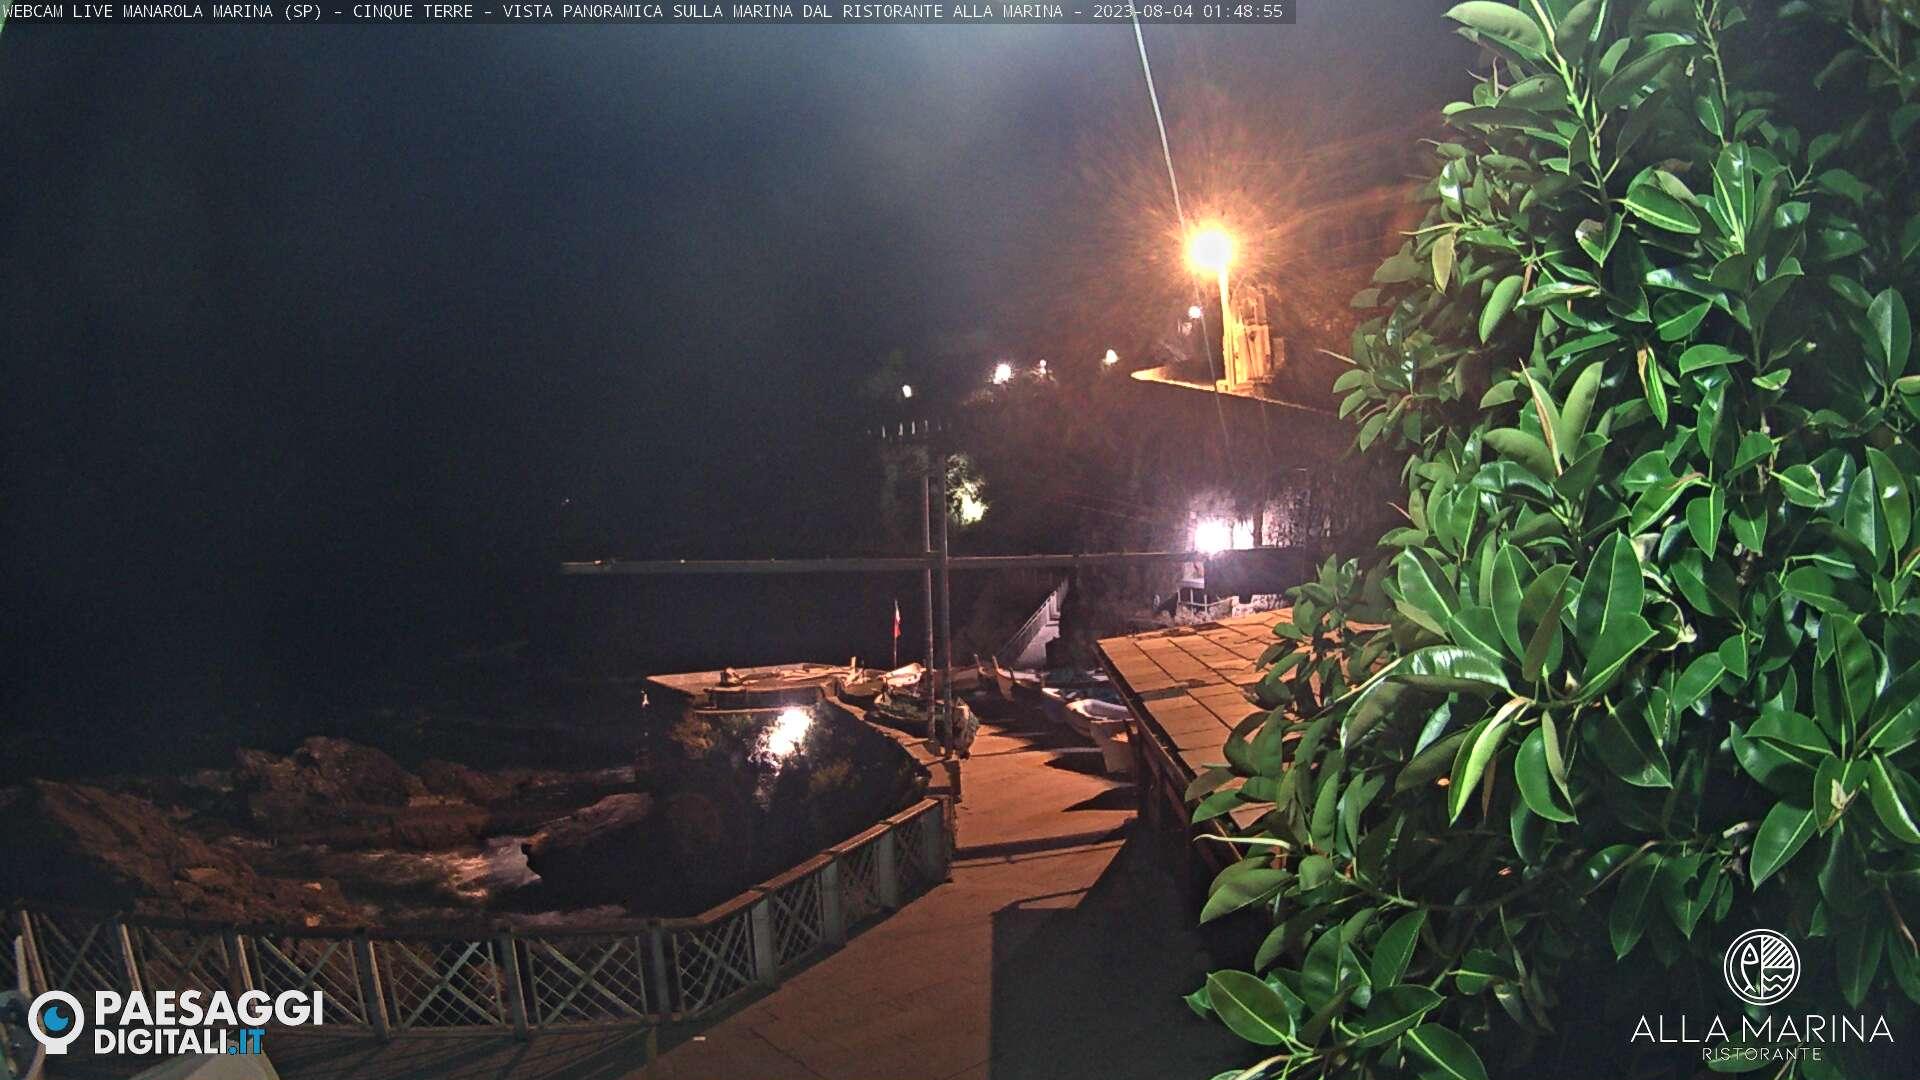 Webcam à Manarola nelle Cinque Terre